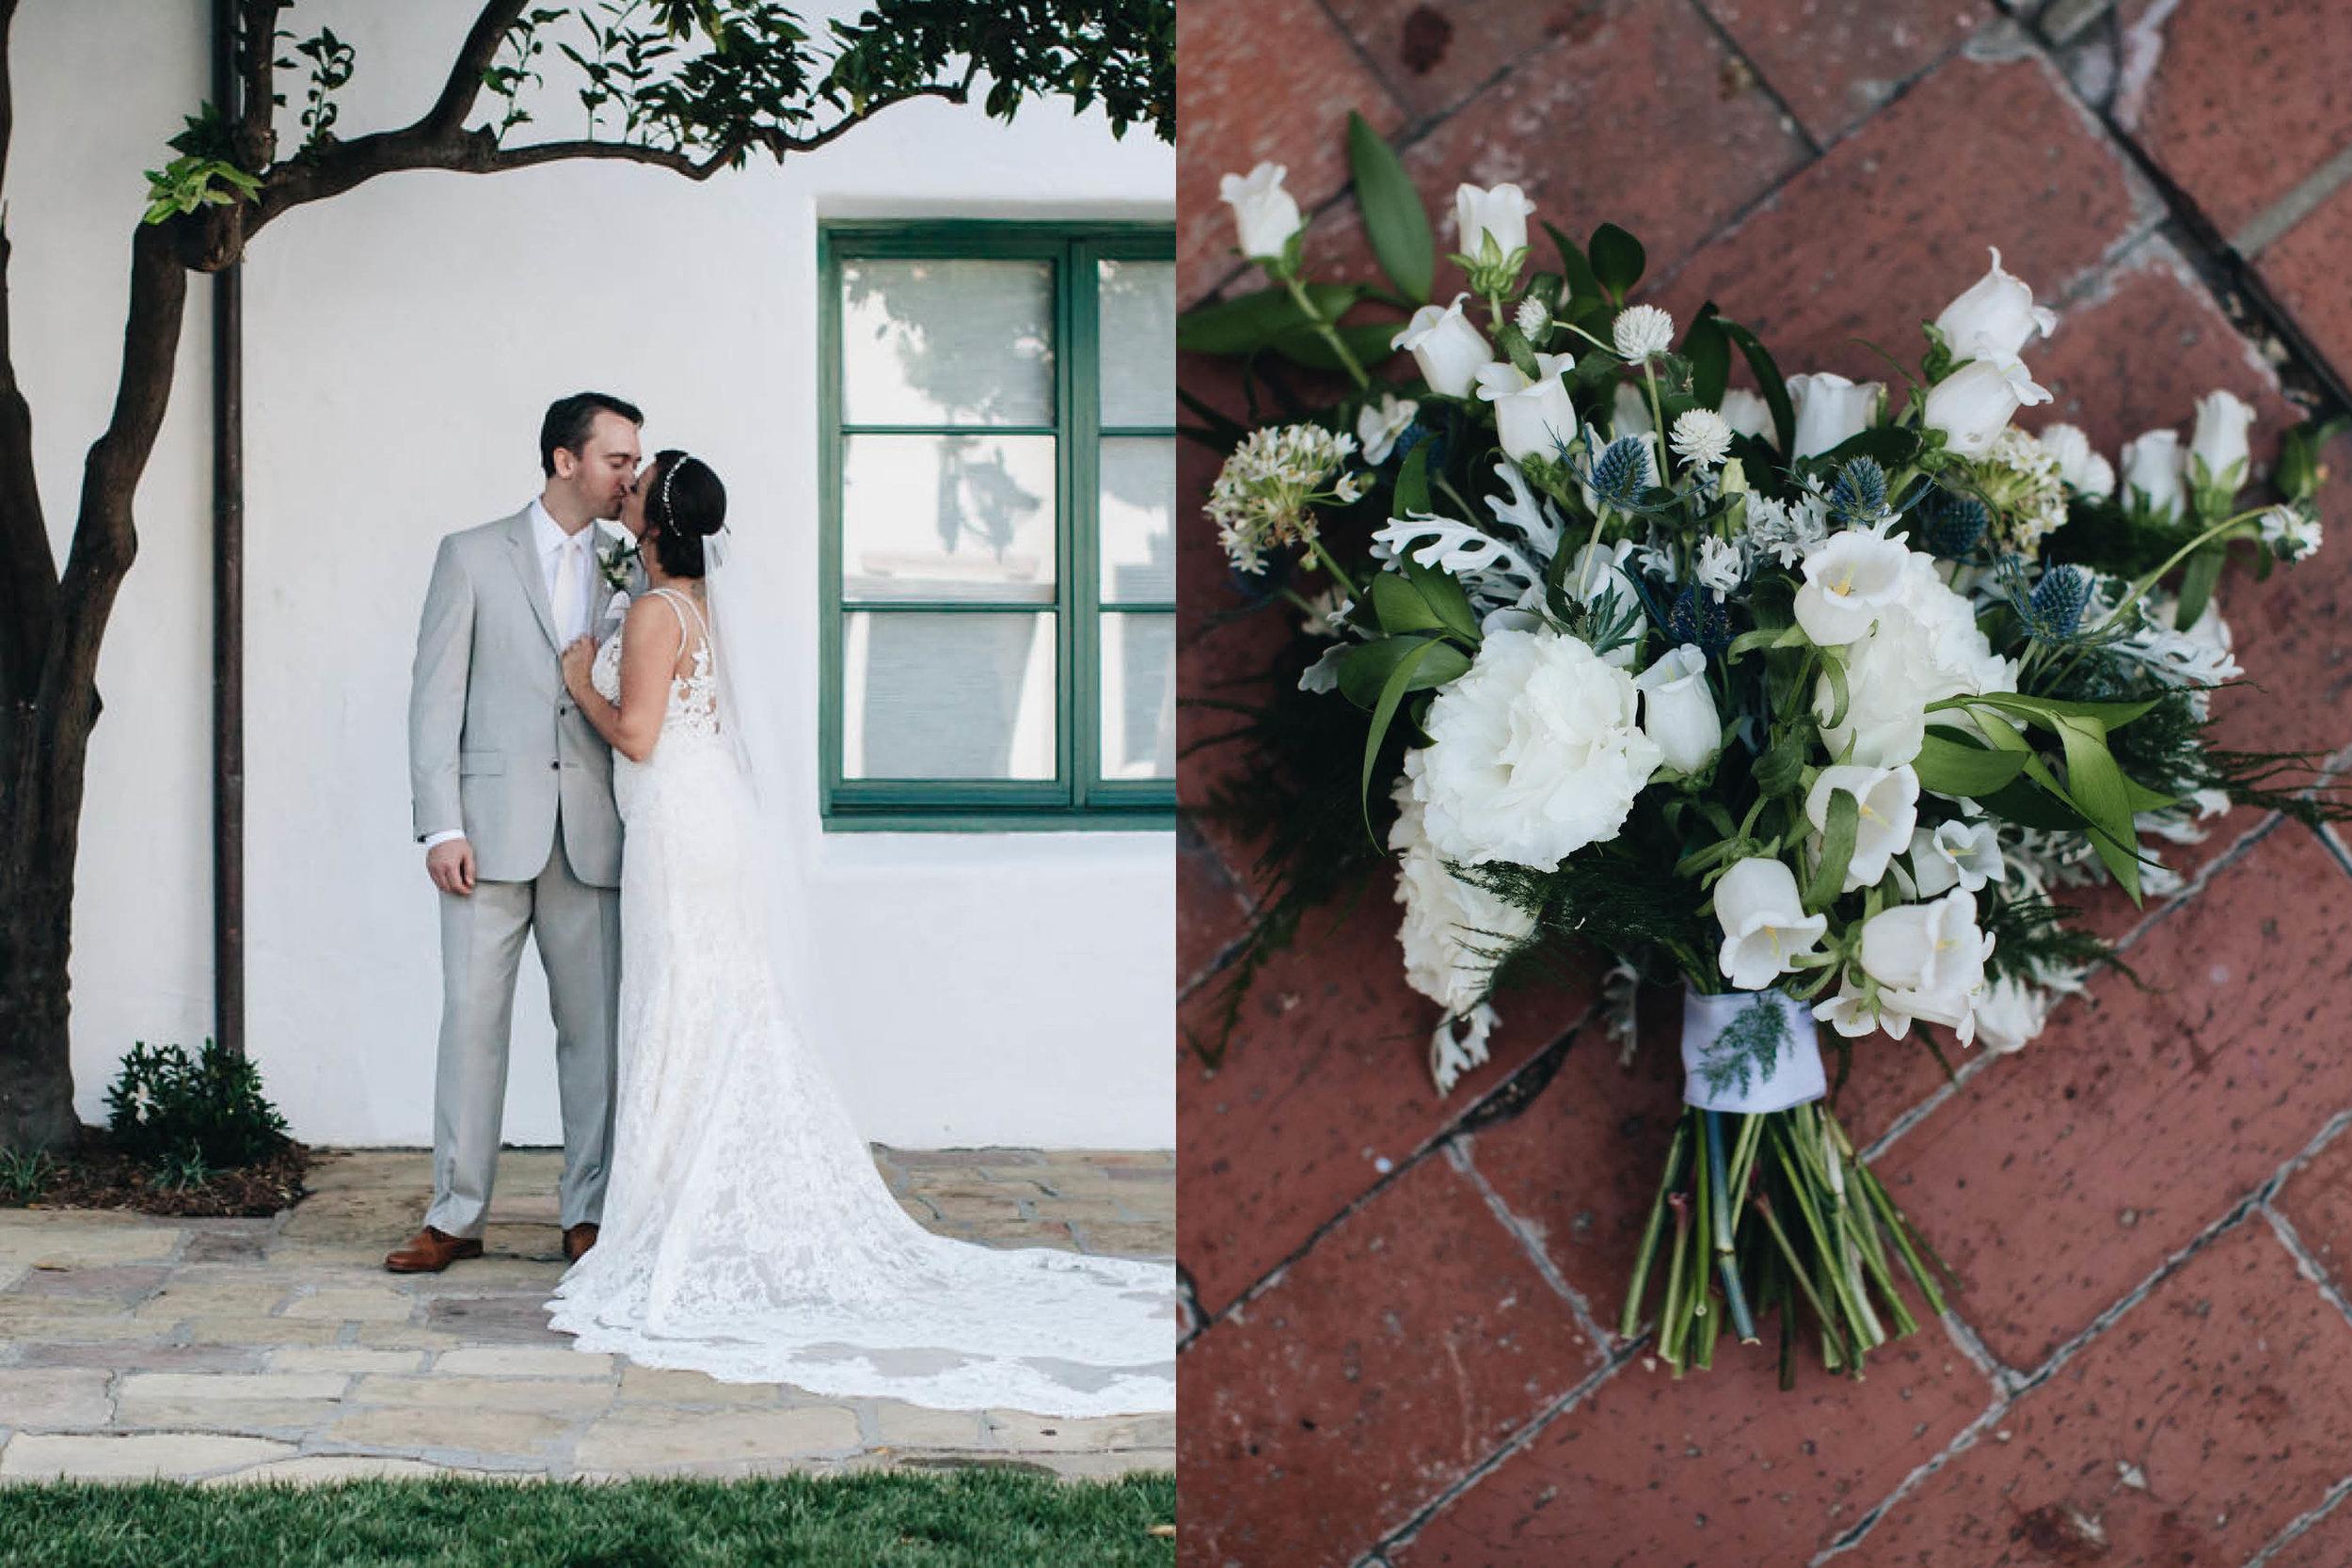 santa-barbara-elopement-wedding-planner-planning-coordination-day-of-coordinator-downtown-garden-oasis-float-spa-fountain-blue-white-event-design-vintage-china (10).jpg